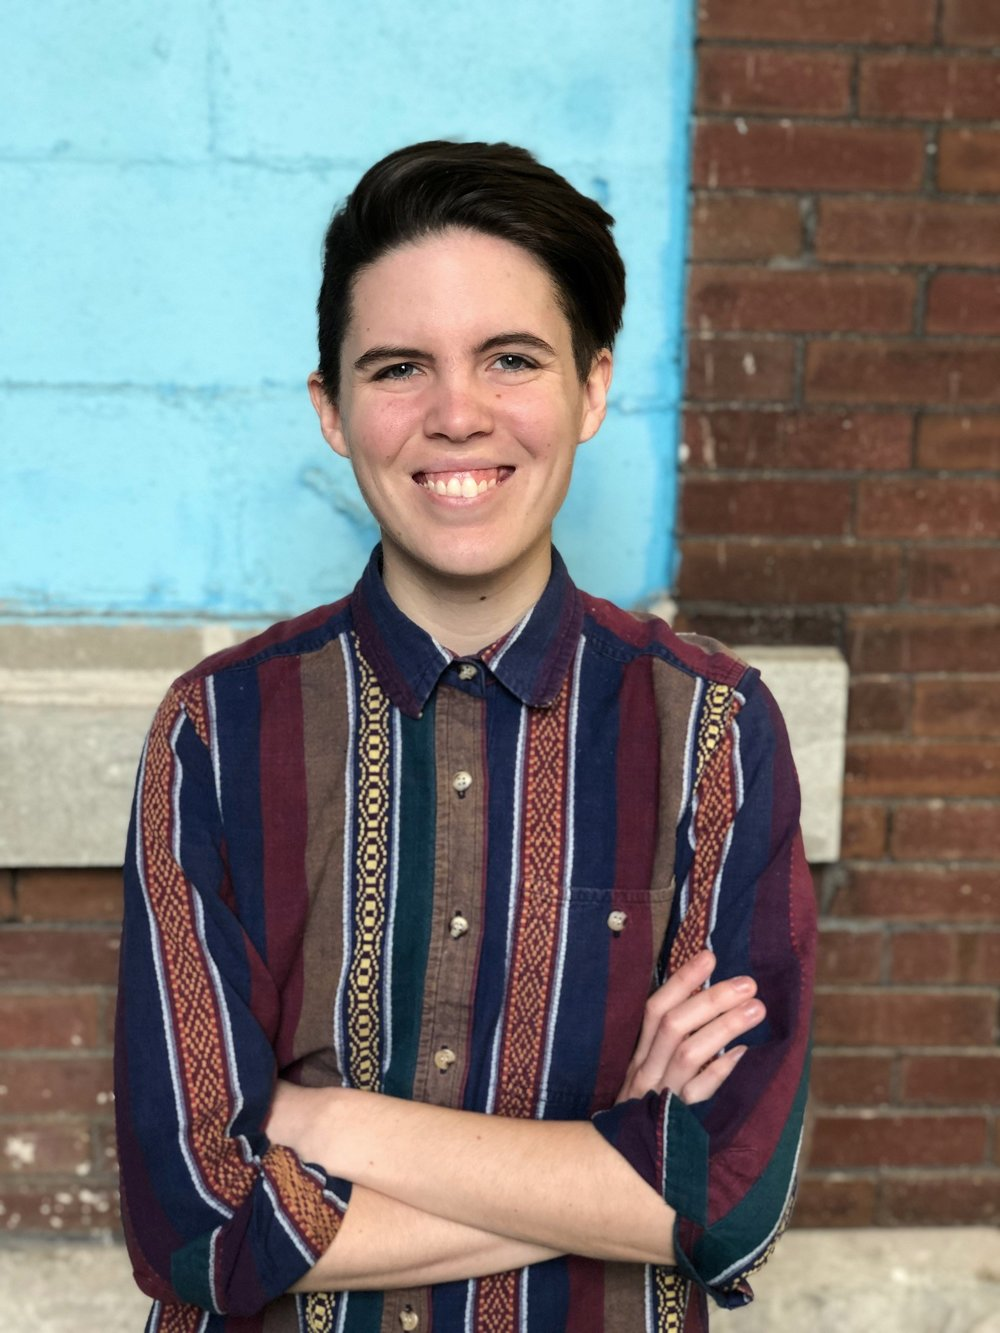 Beth Watkins - Program Assistantbeth@irwpstl.org